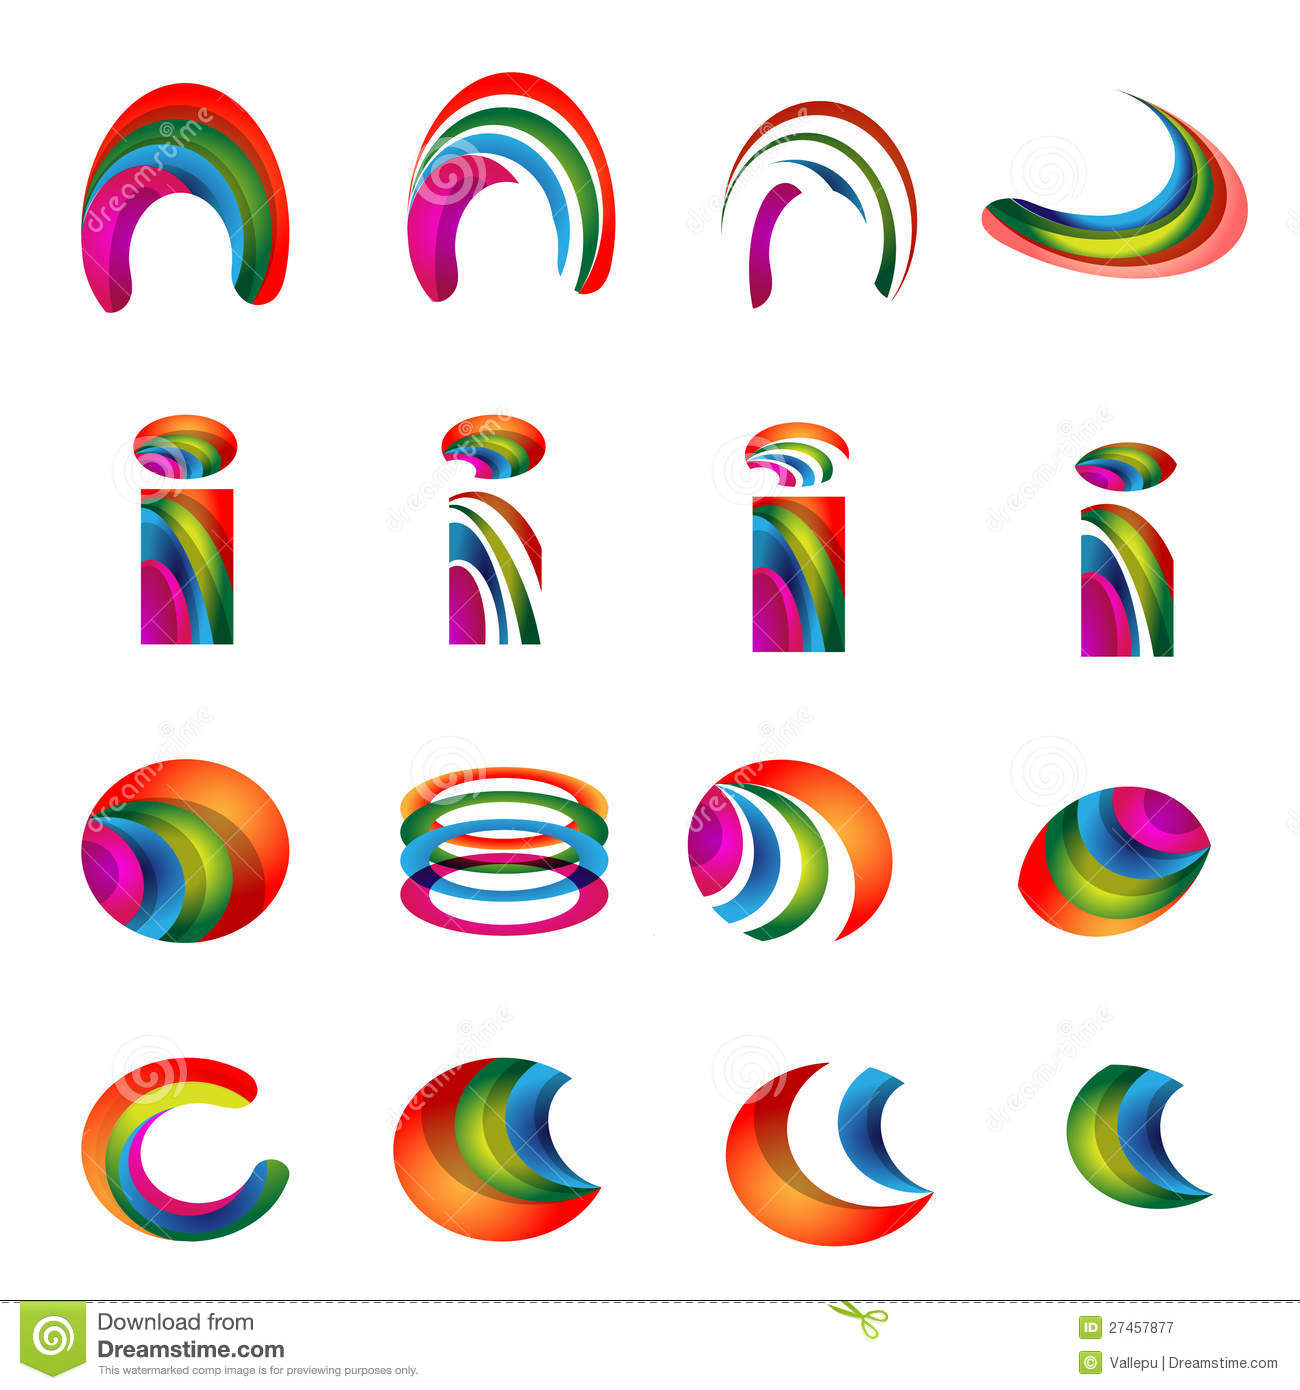 Free alphabet logo clipart graphic download Vector Alphabet Vibrant Logo Designs Version 2 Royalty Free Stock ... graphic download